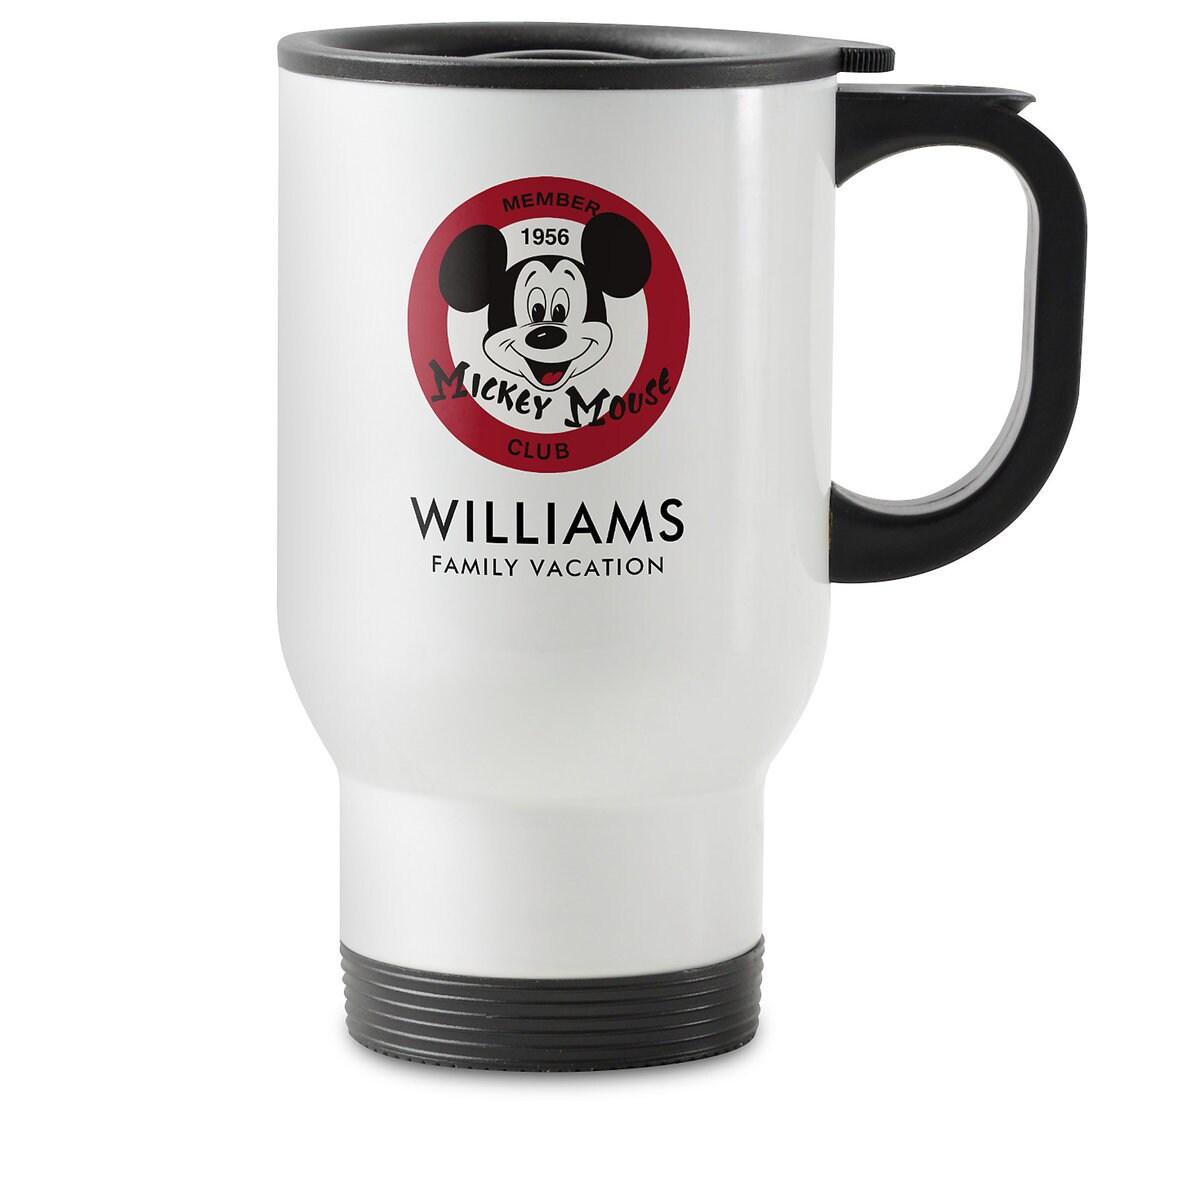 8a91594450f Mickey Mouse Club Travel Mug - Customizable